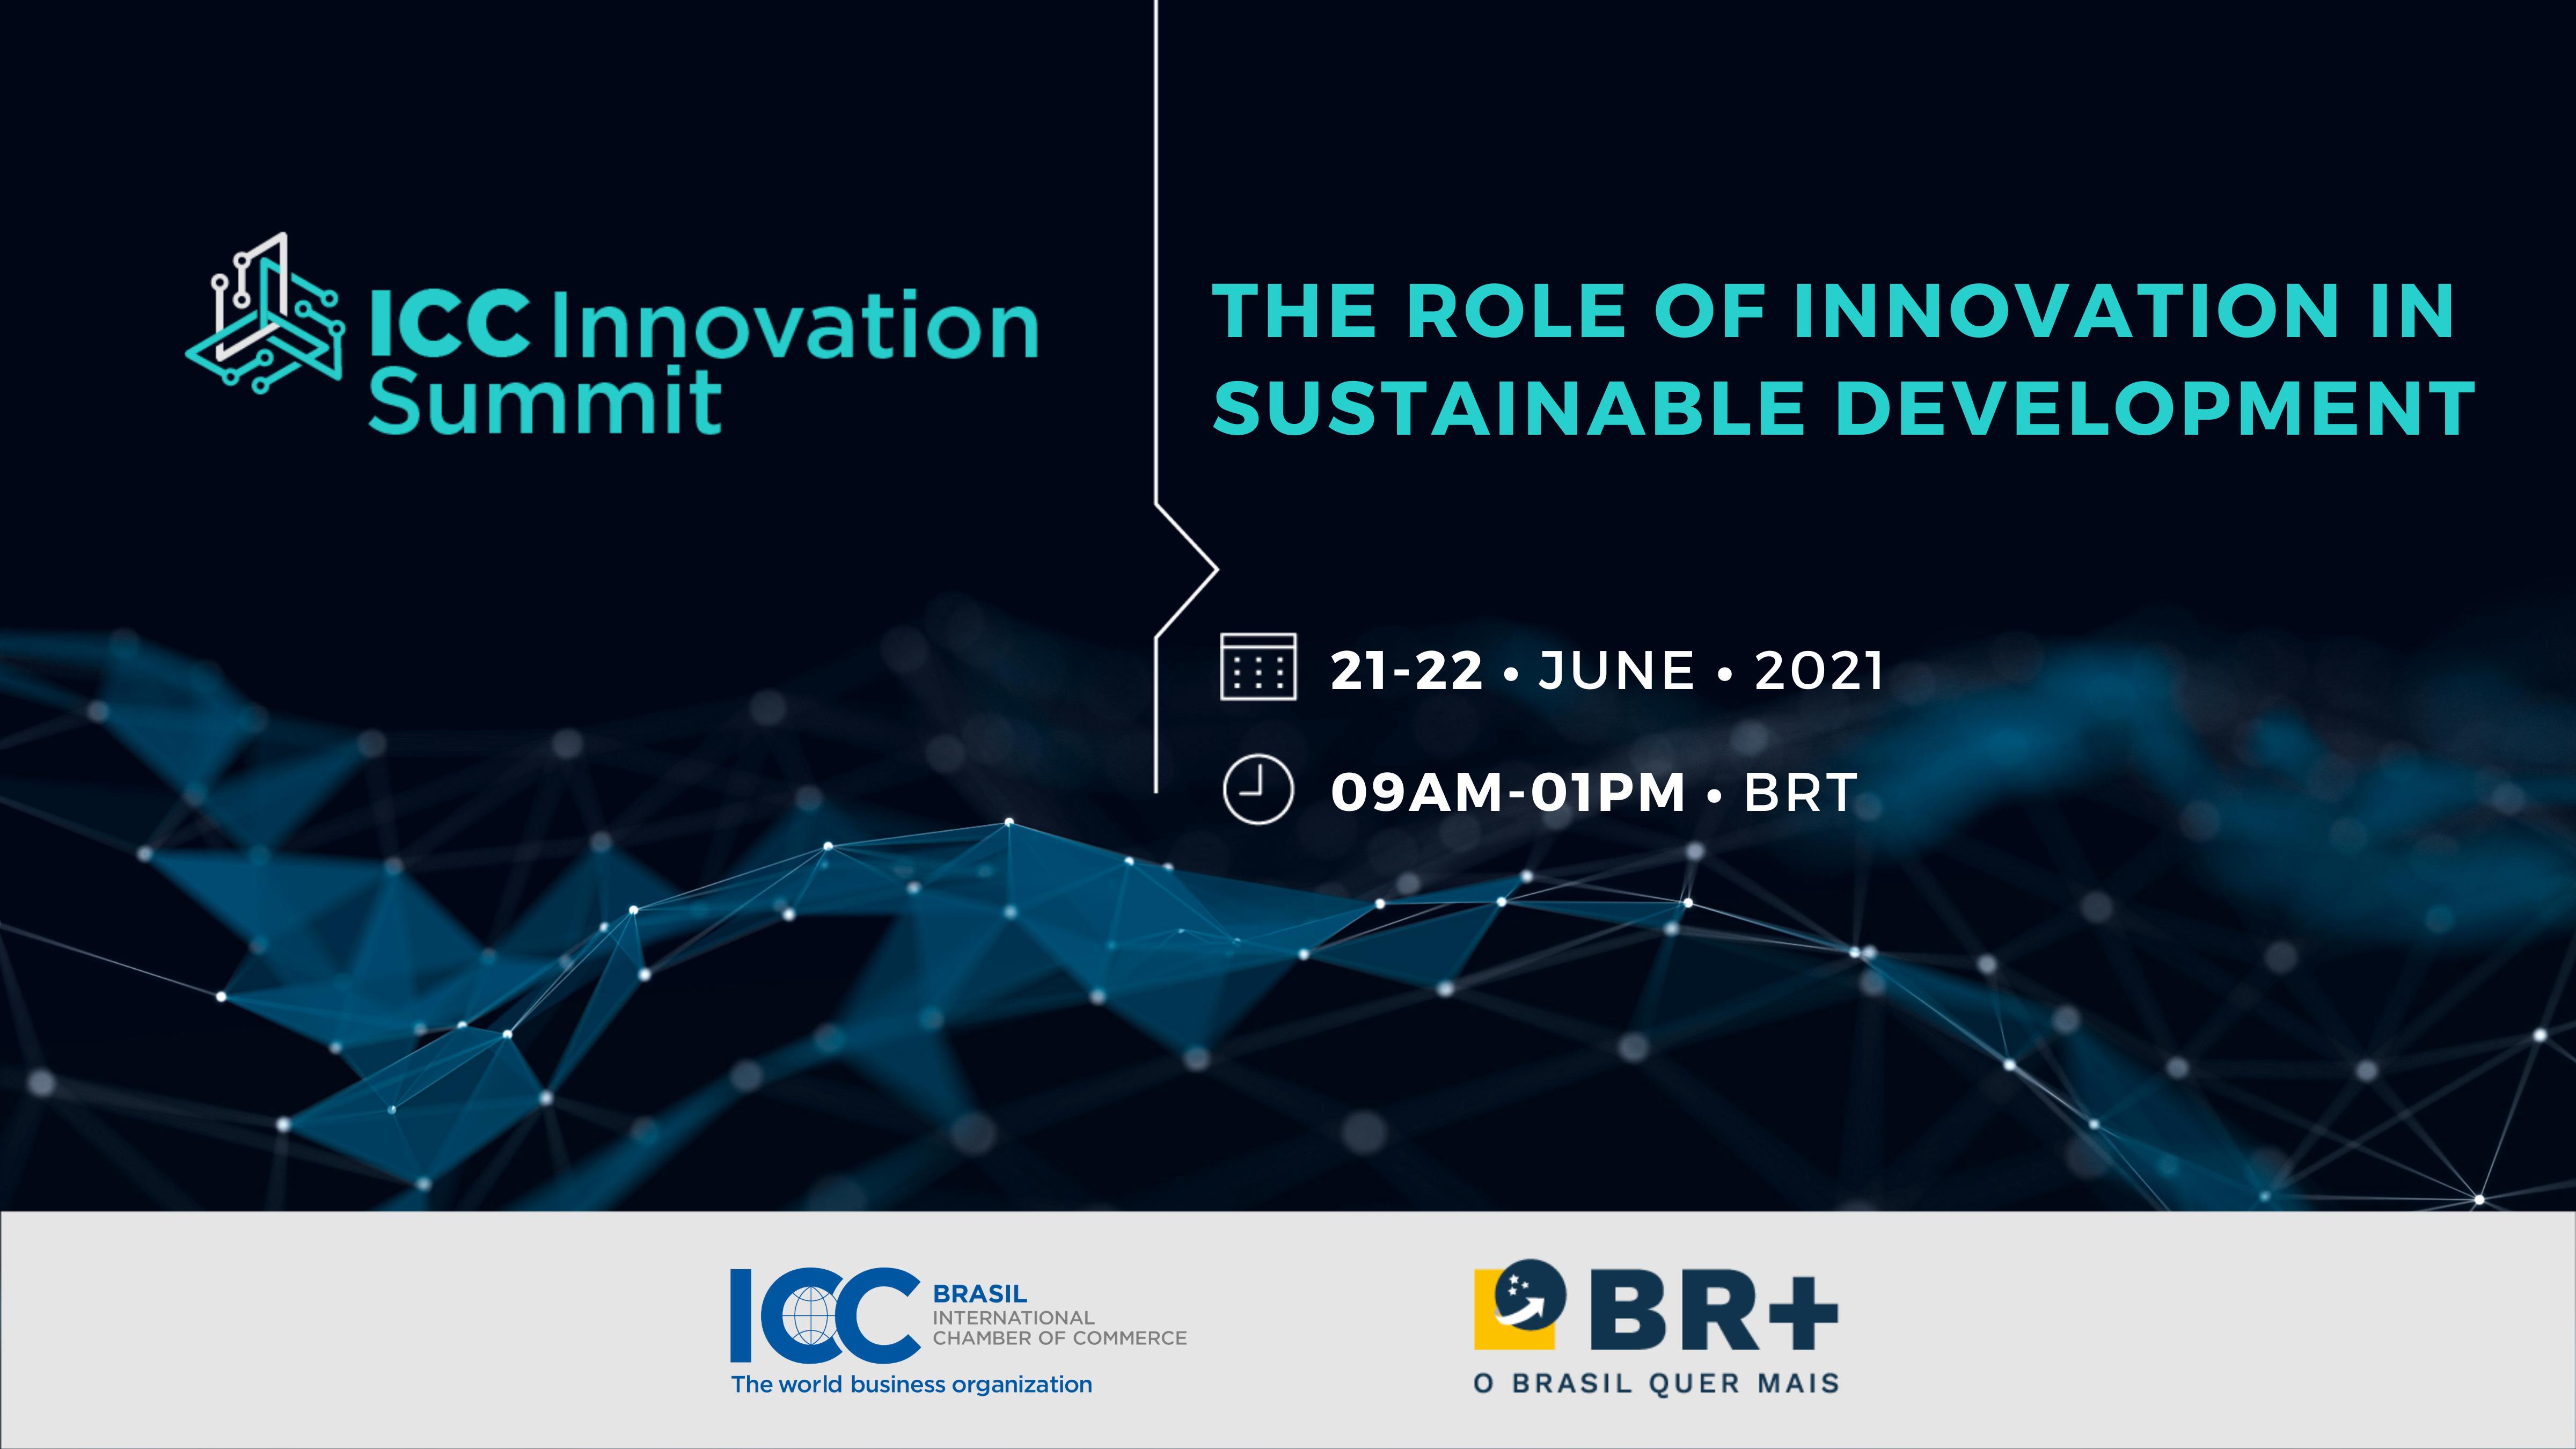 1st ICC Brazil Innovation Summit